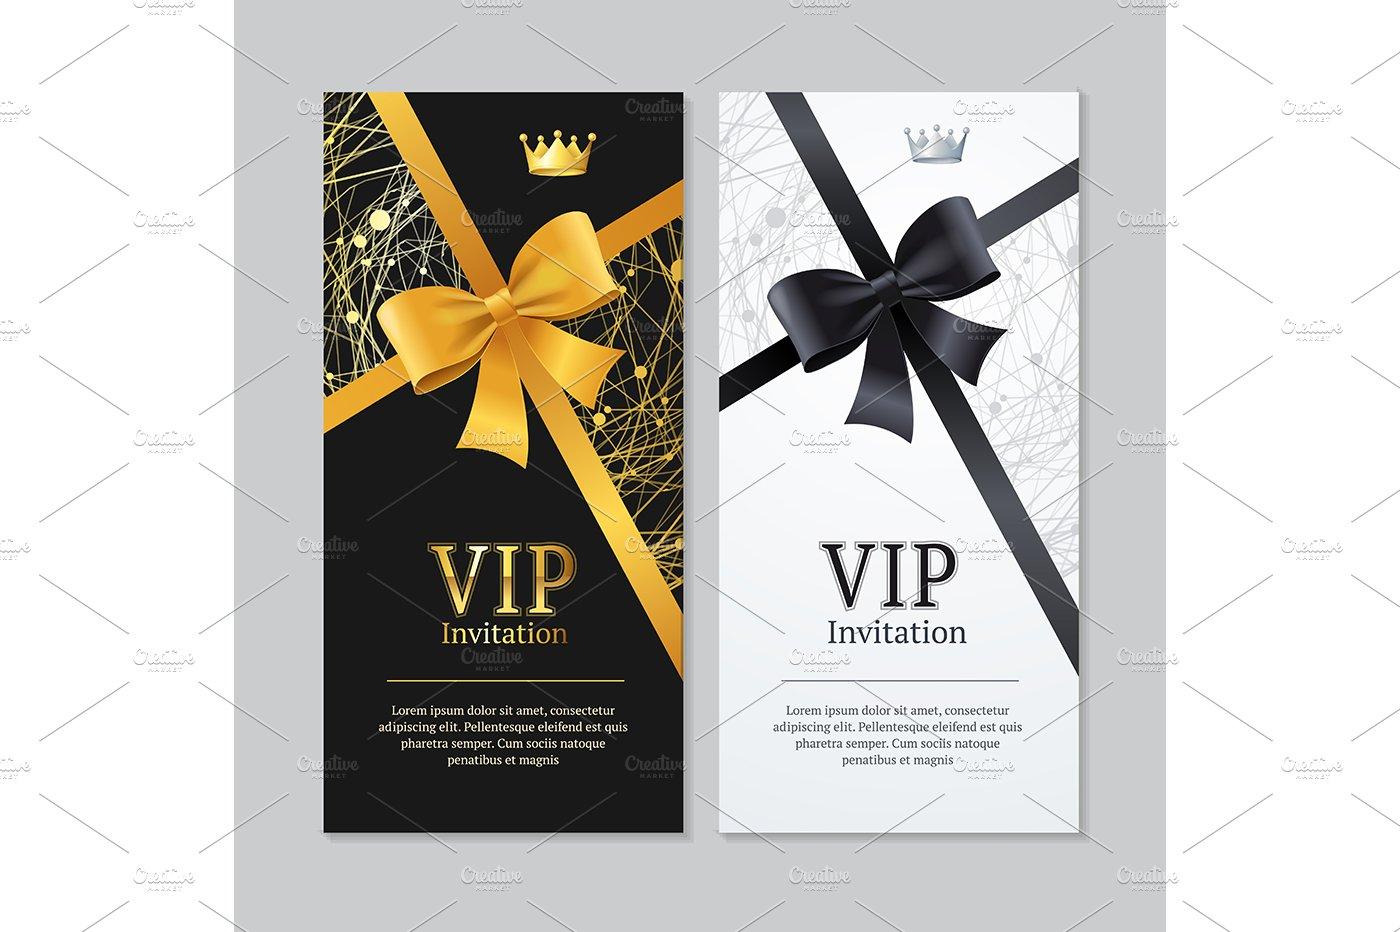 Vip Invitation And Card Illustrations Creative Market